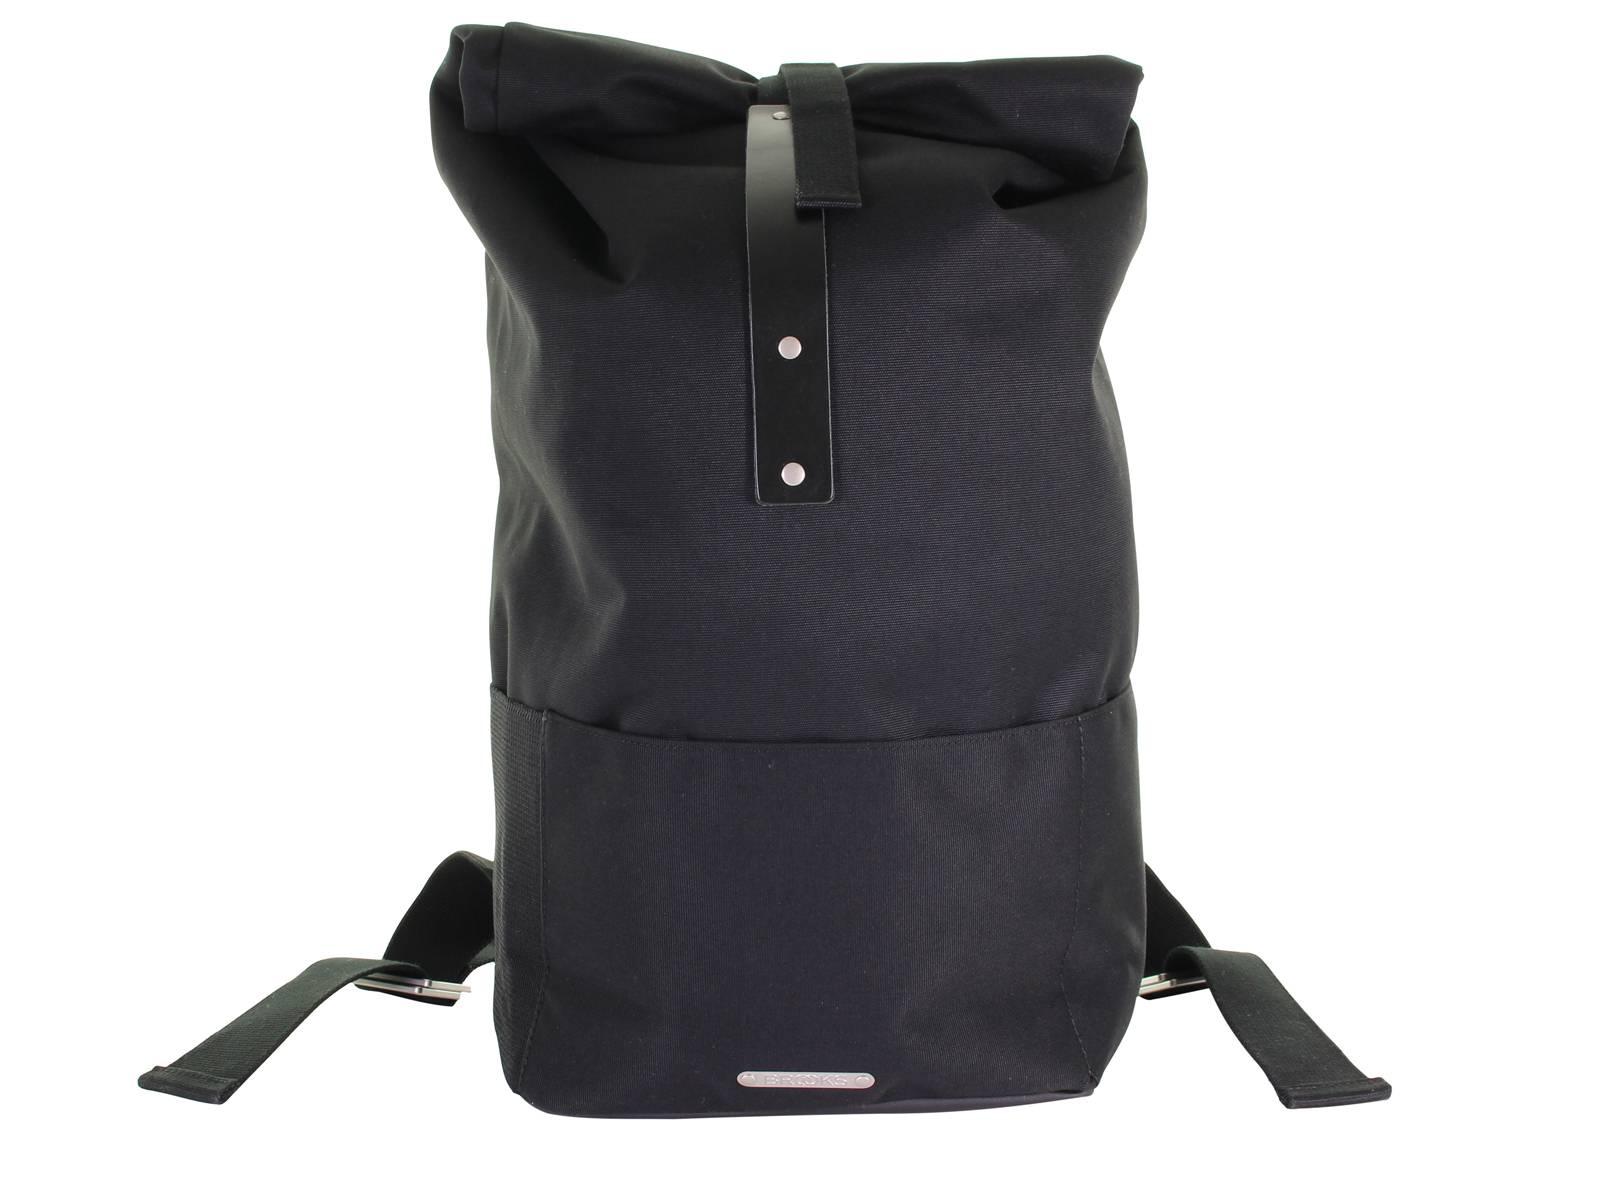 bfb69aa9d5 Brooks backpack Hackney black   Bicyclecomfort